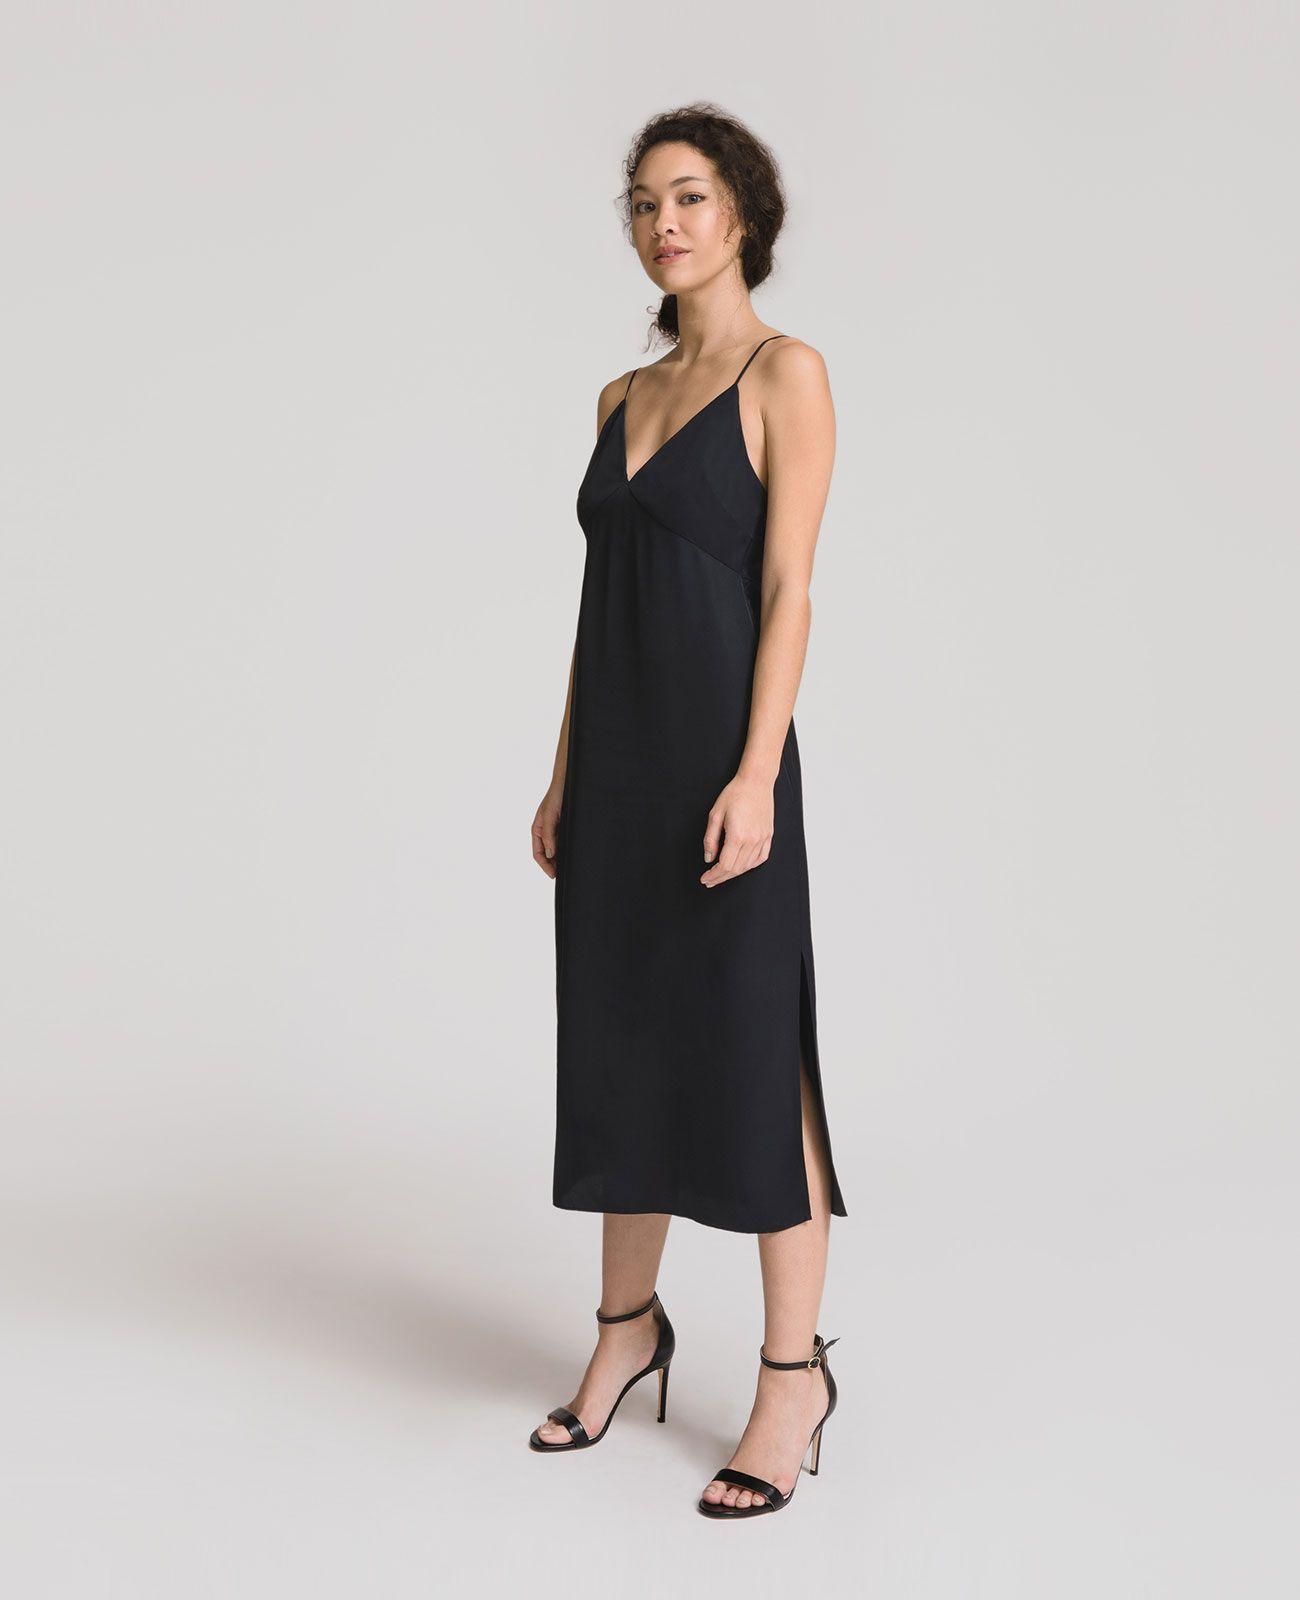 a2100b53eba6 Silk Panelled V-Neck Slip Dress in 2019   Stitch Fix   Dresses, Slip ...